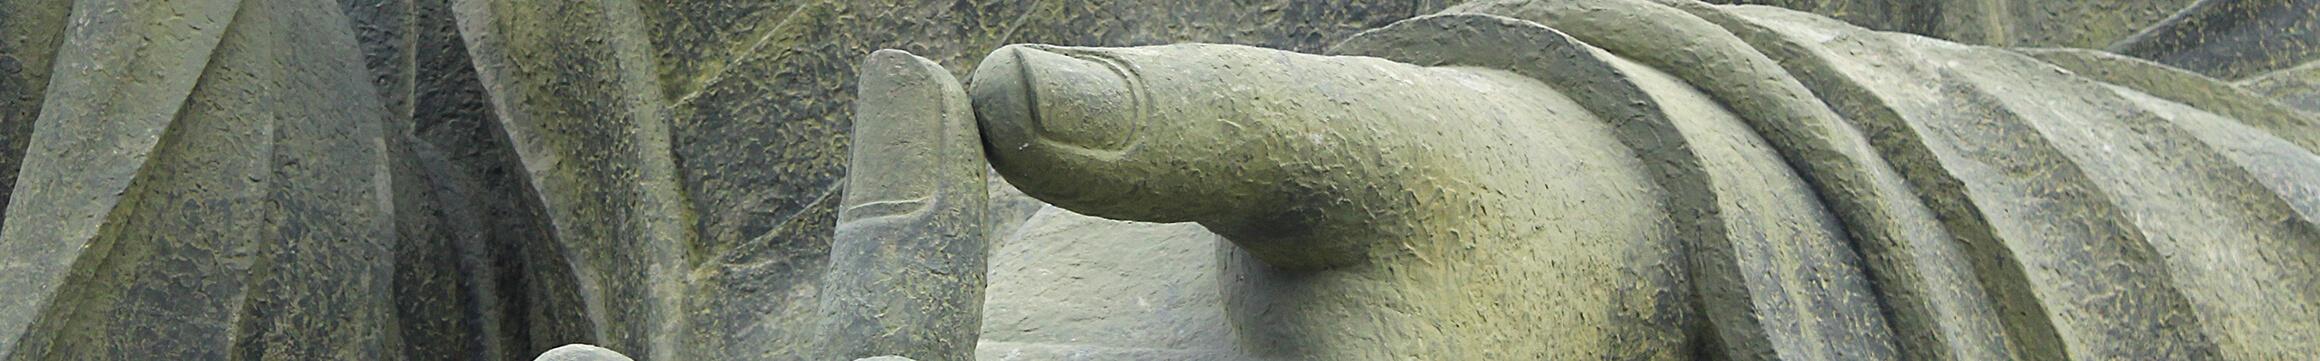 Buddhist 04